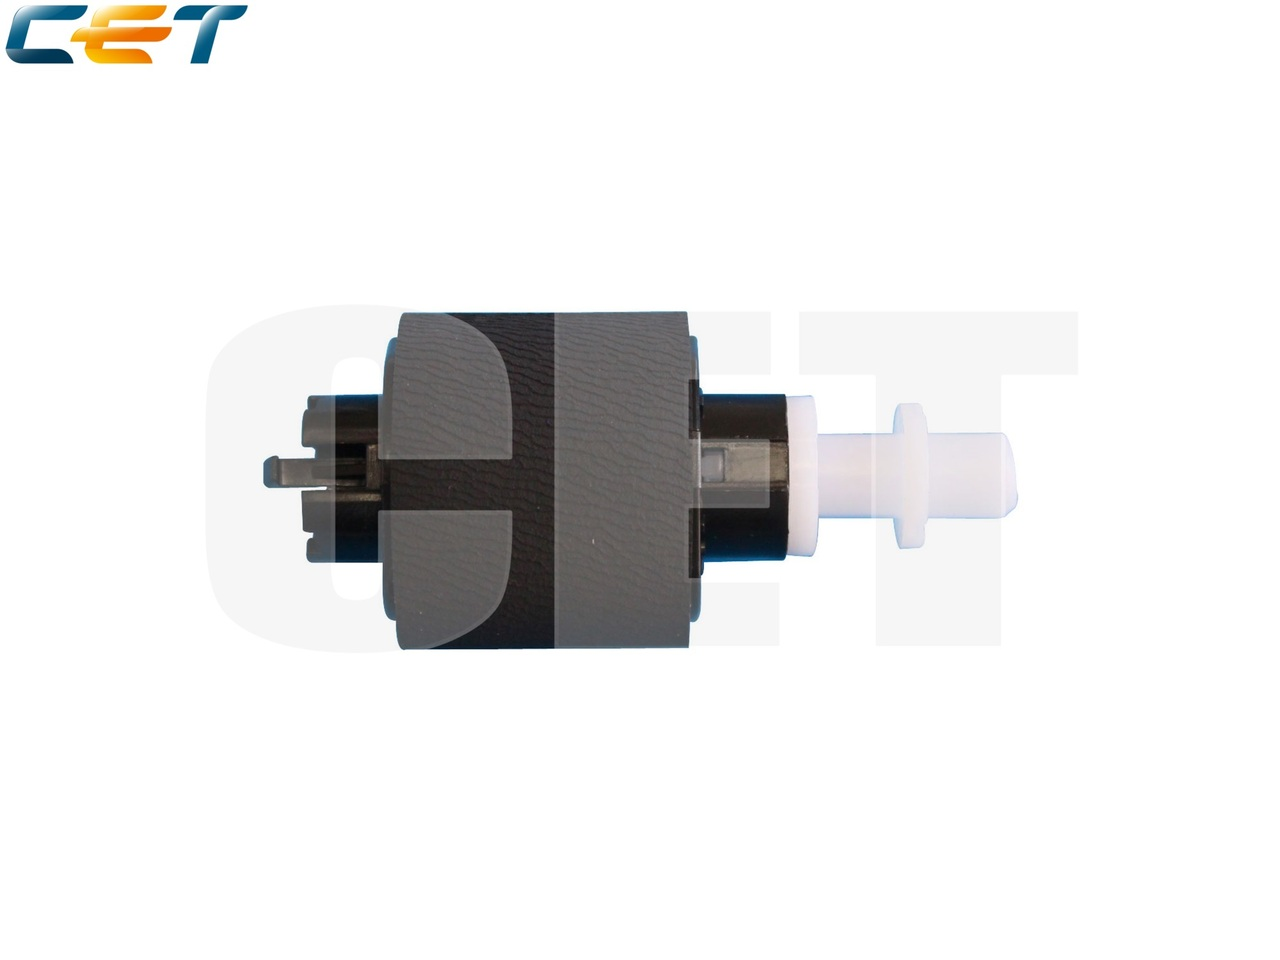 Ролик подхвата 2-го лотка RL1-3167-000 для HP LaserJetEnterprise P3015/P3005, M521/M525 (CET), CET6696